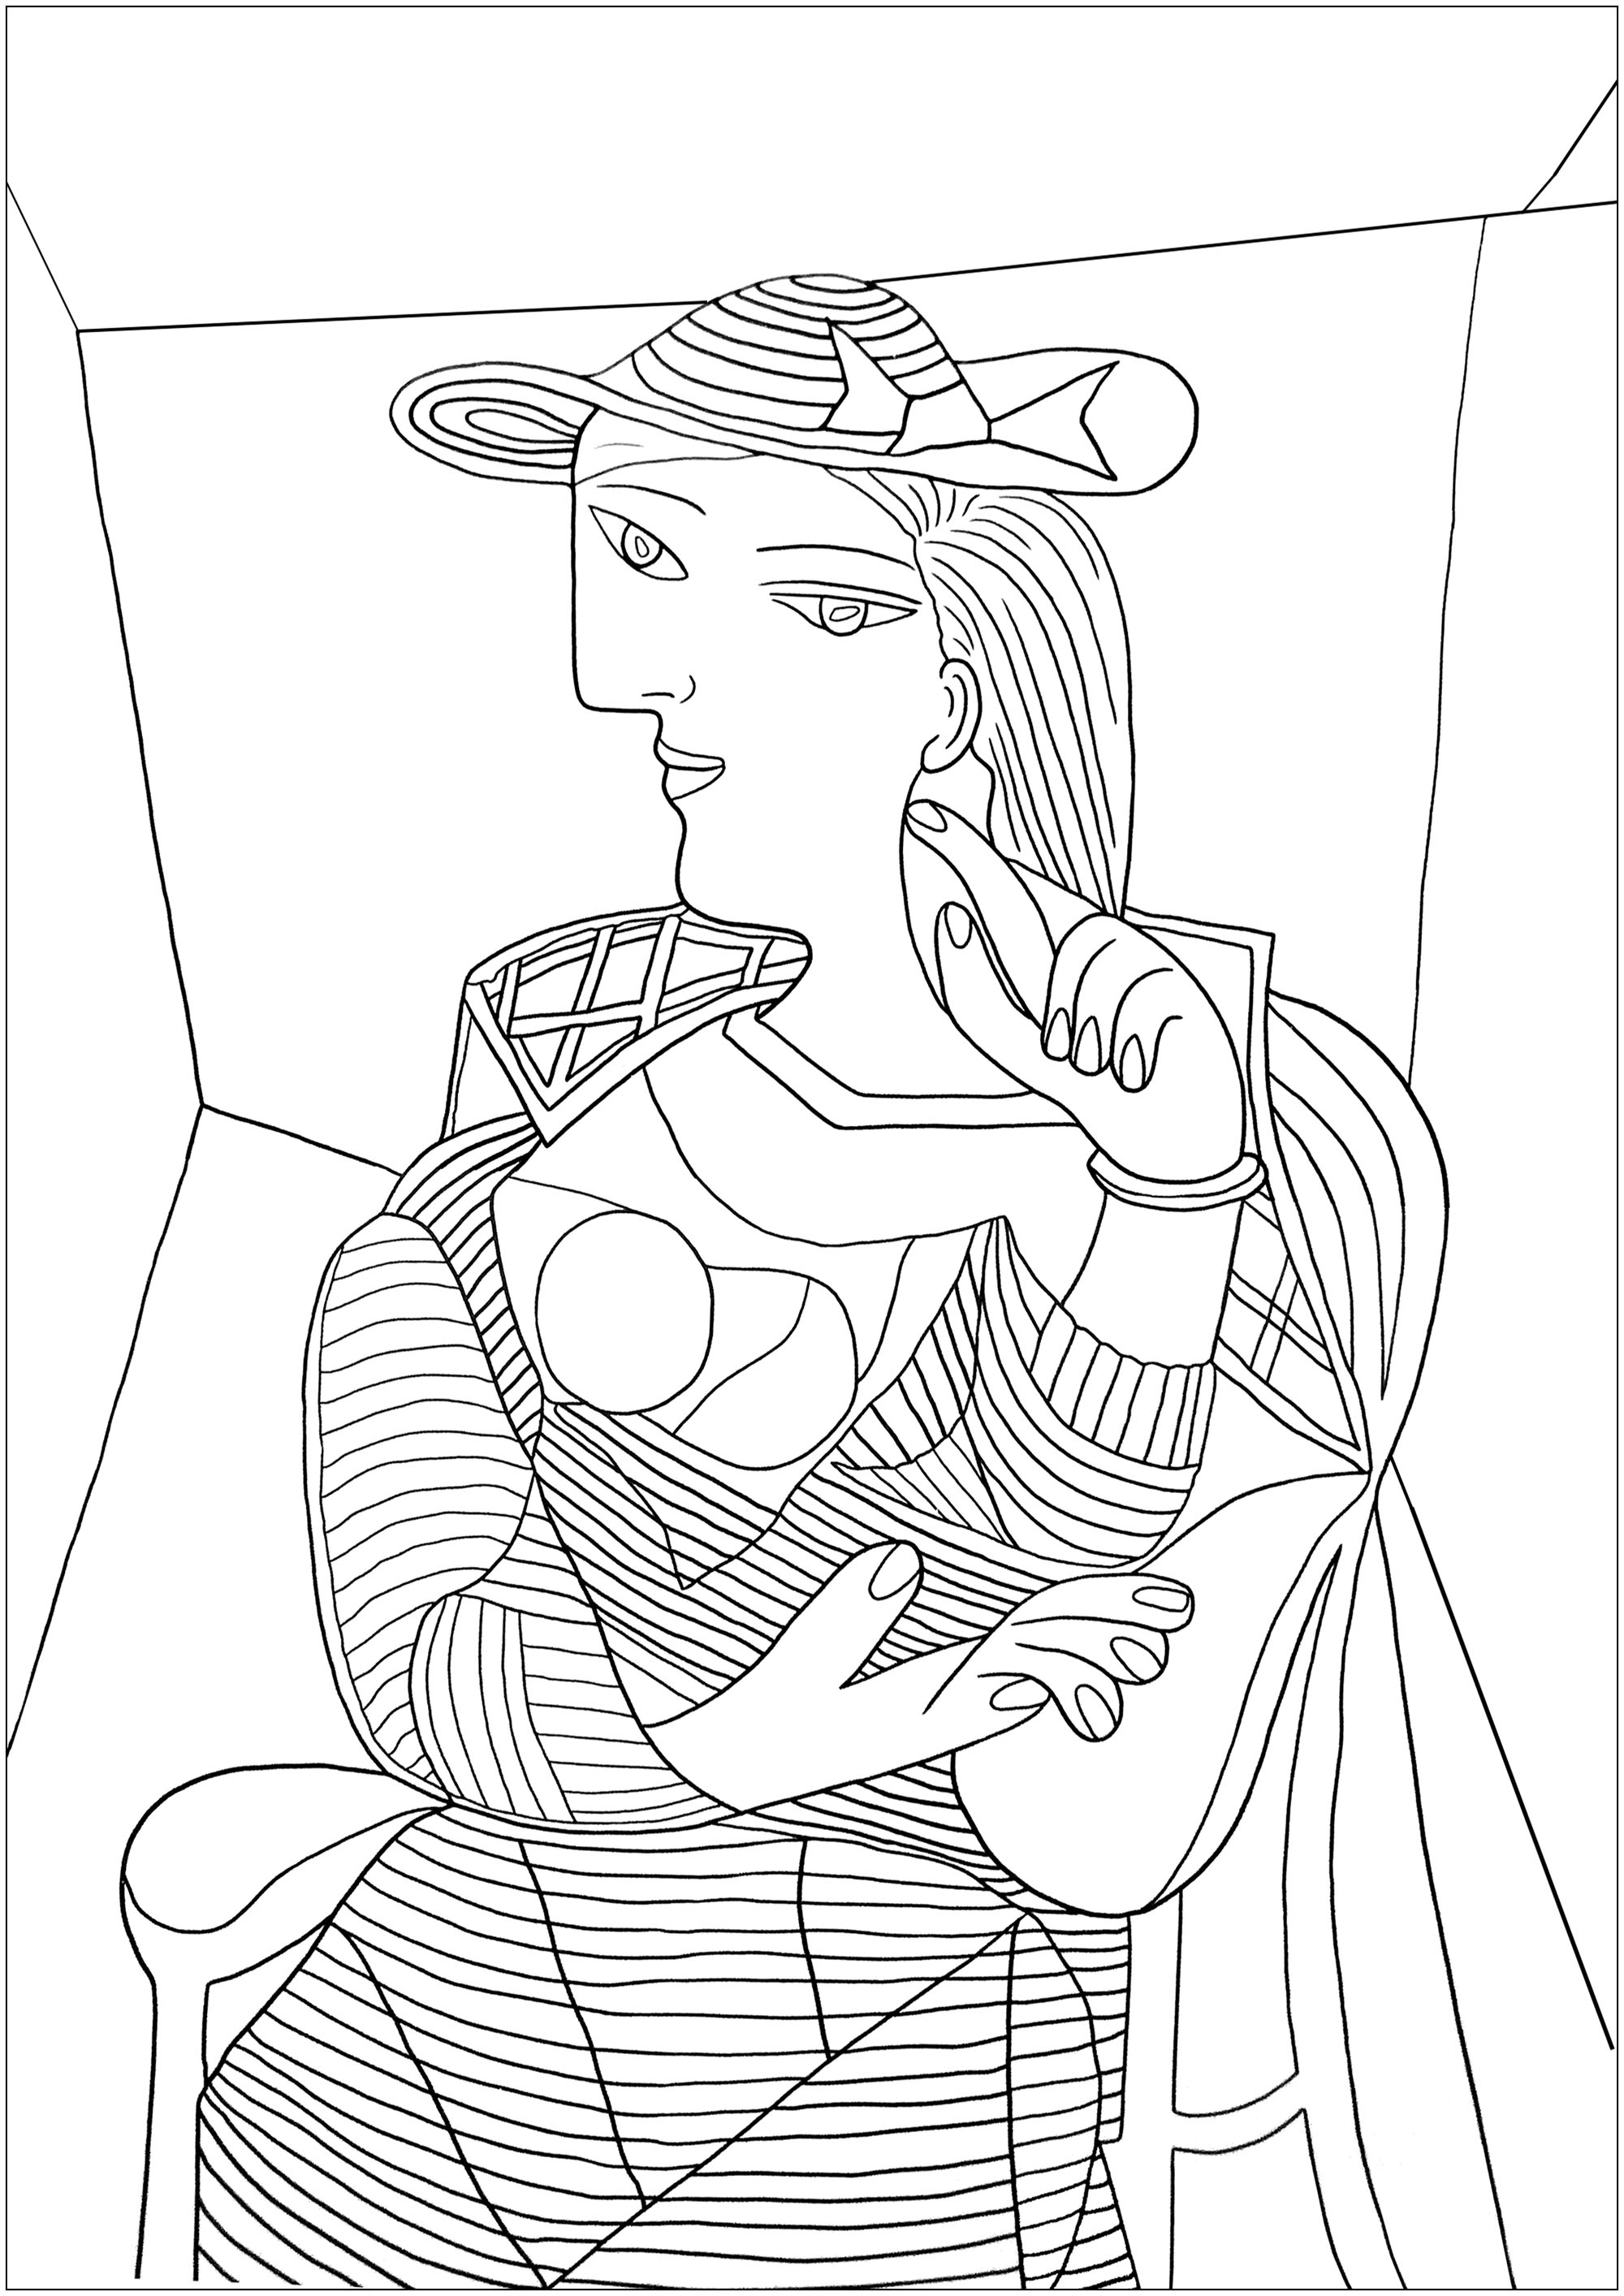 Colorear para Adultos : Obra de arte - 3